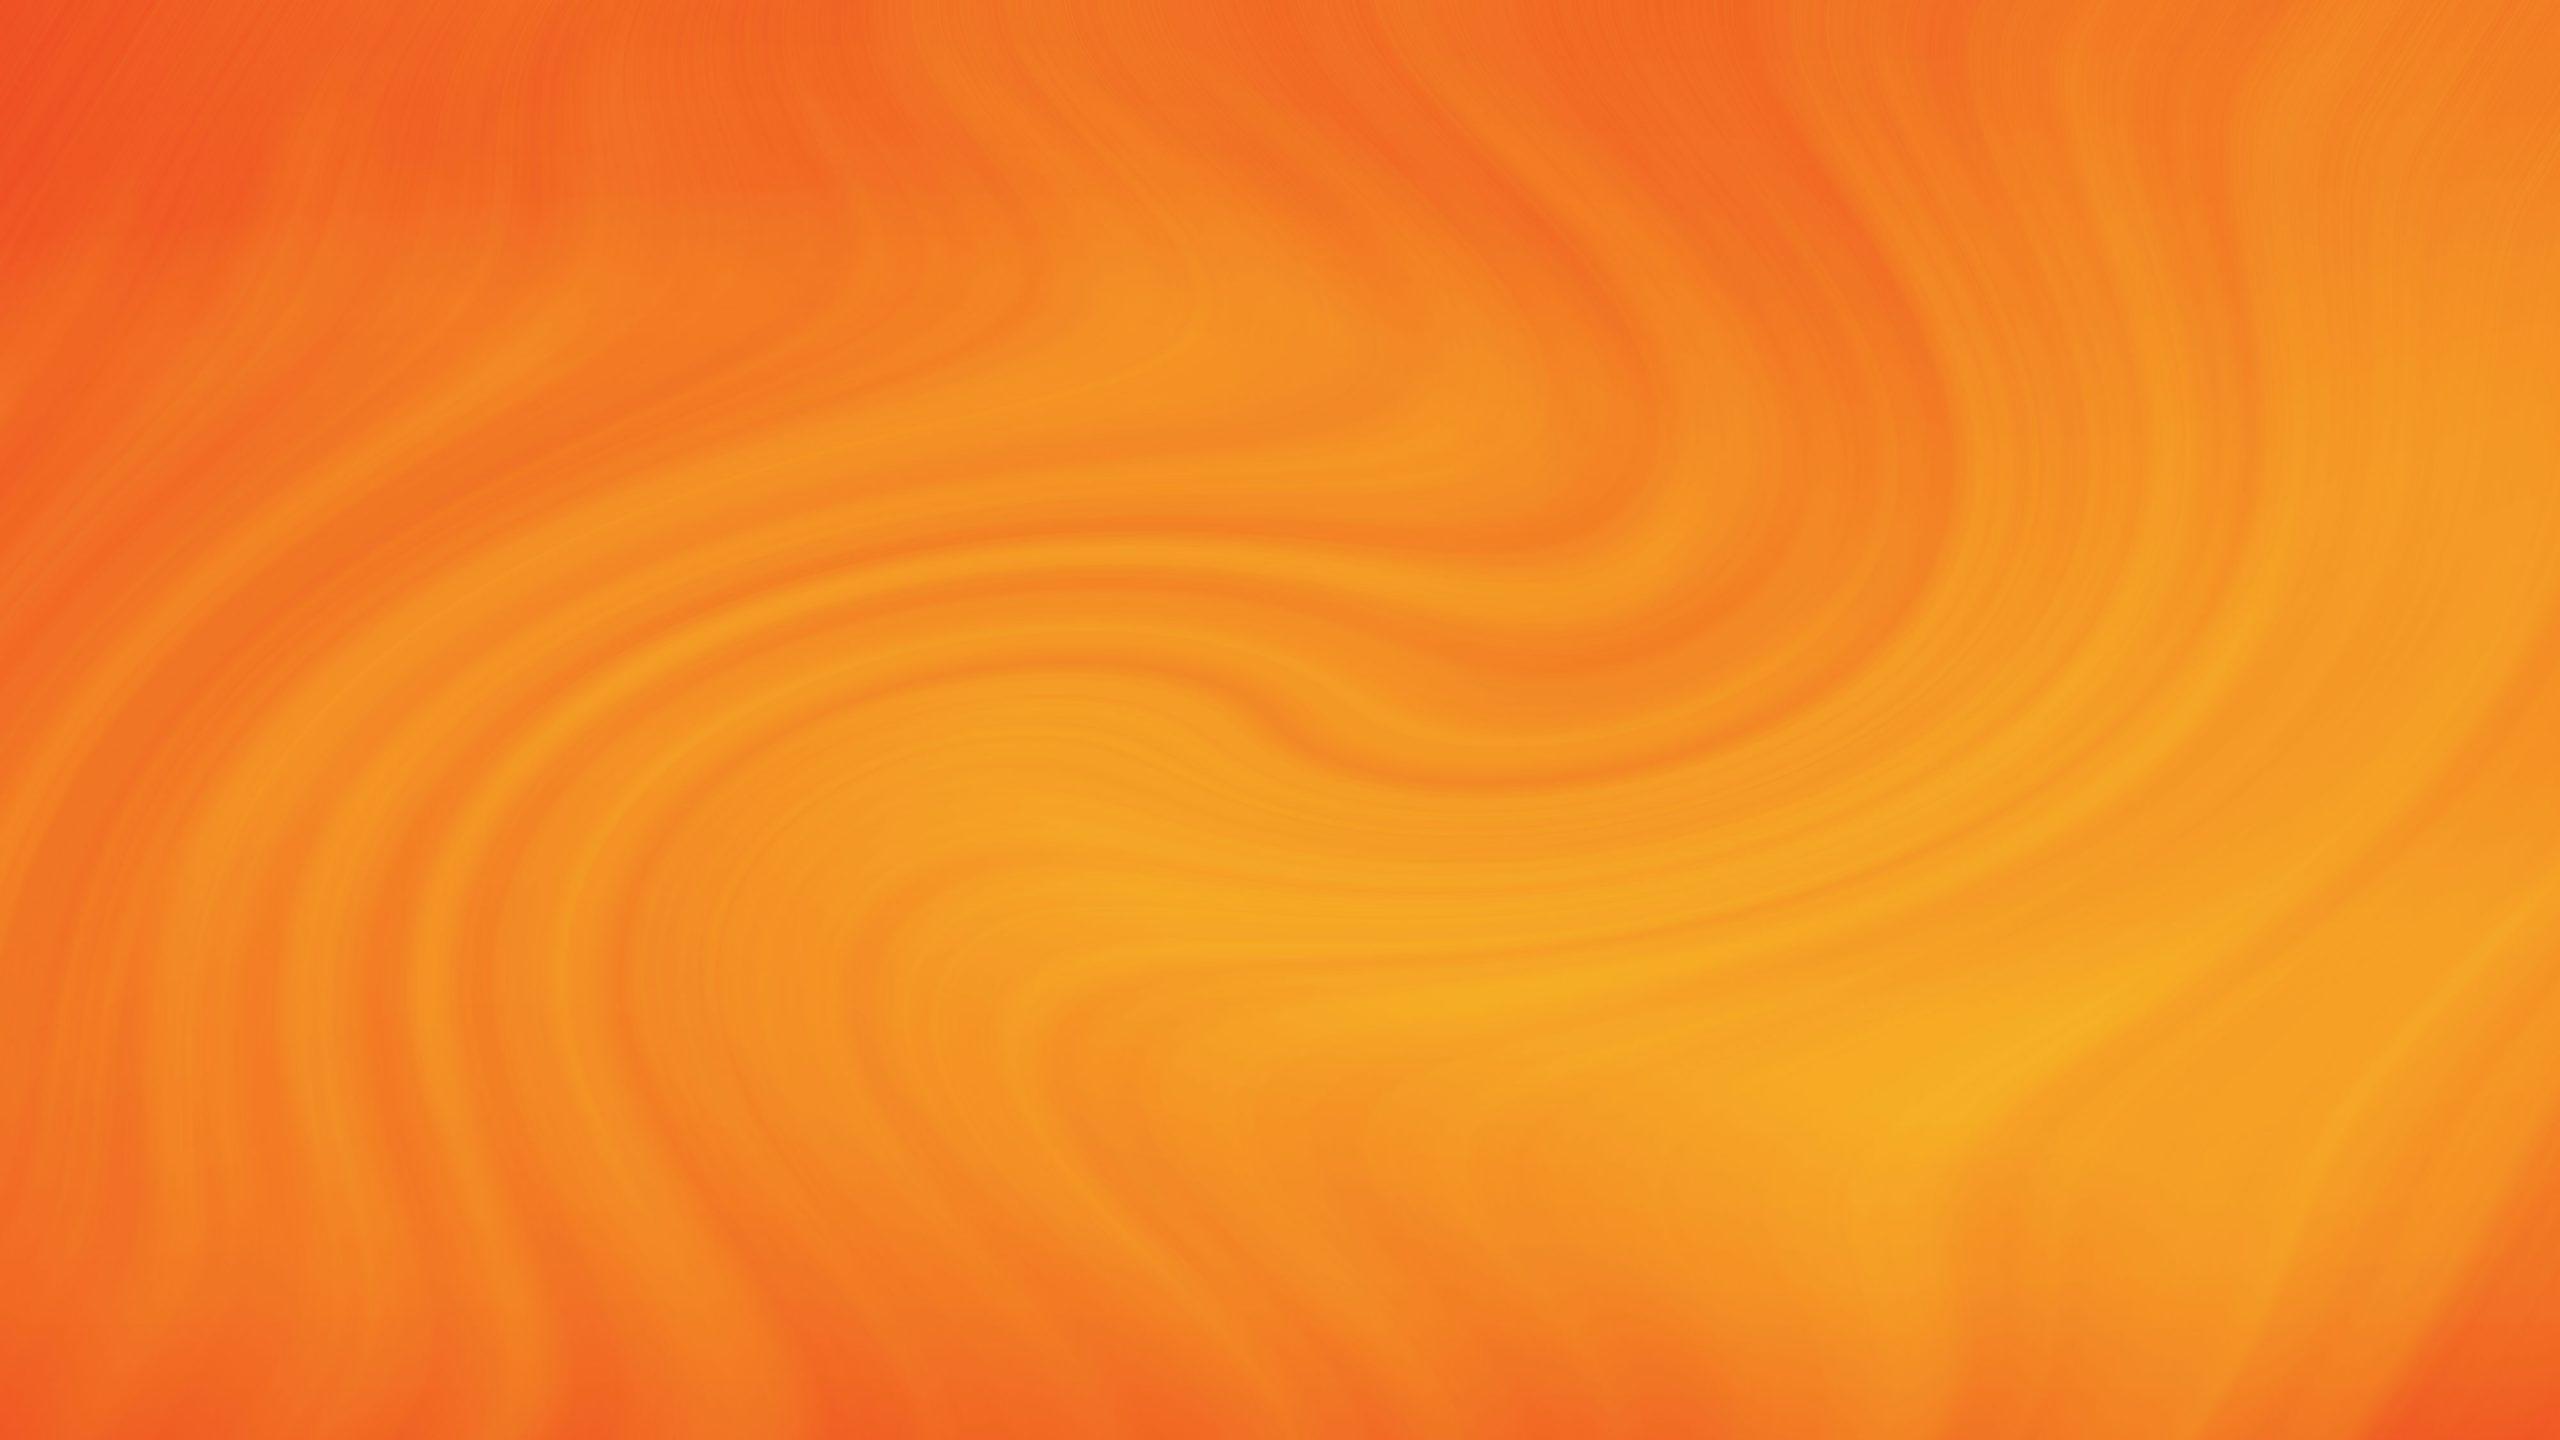 Orange pattern abstract wallpaper